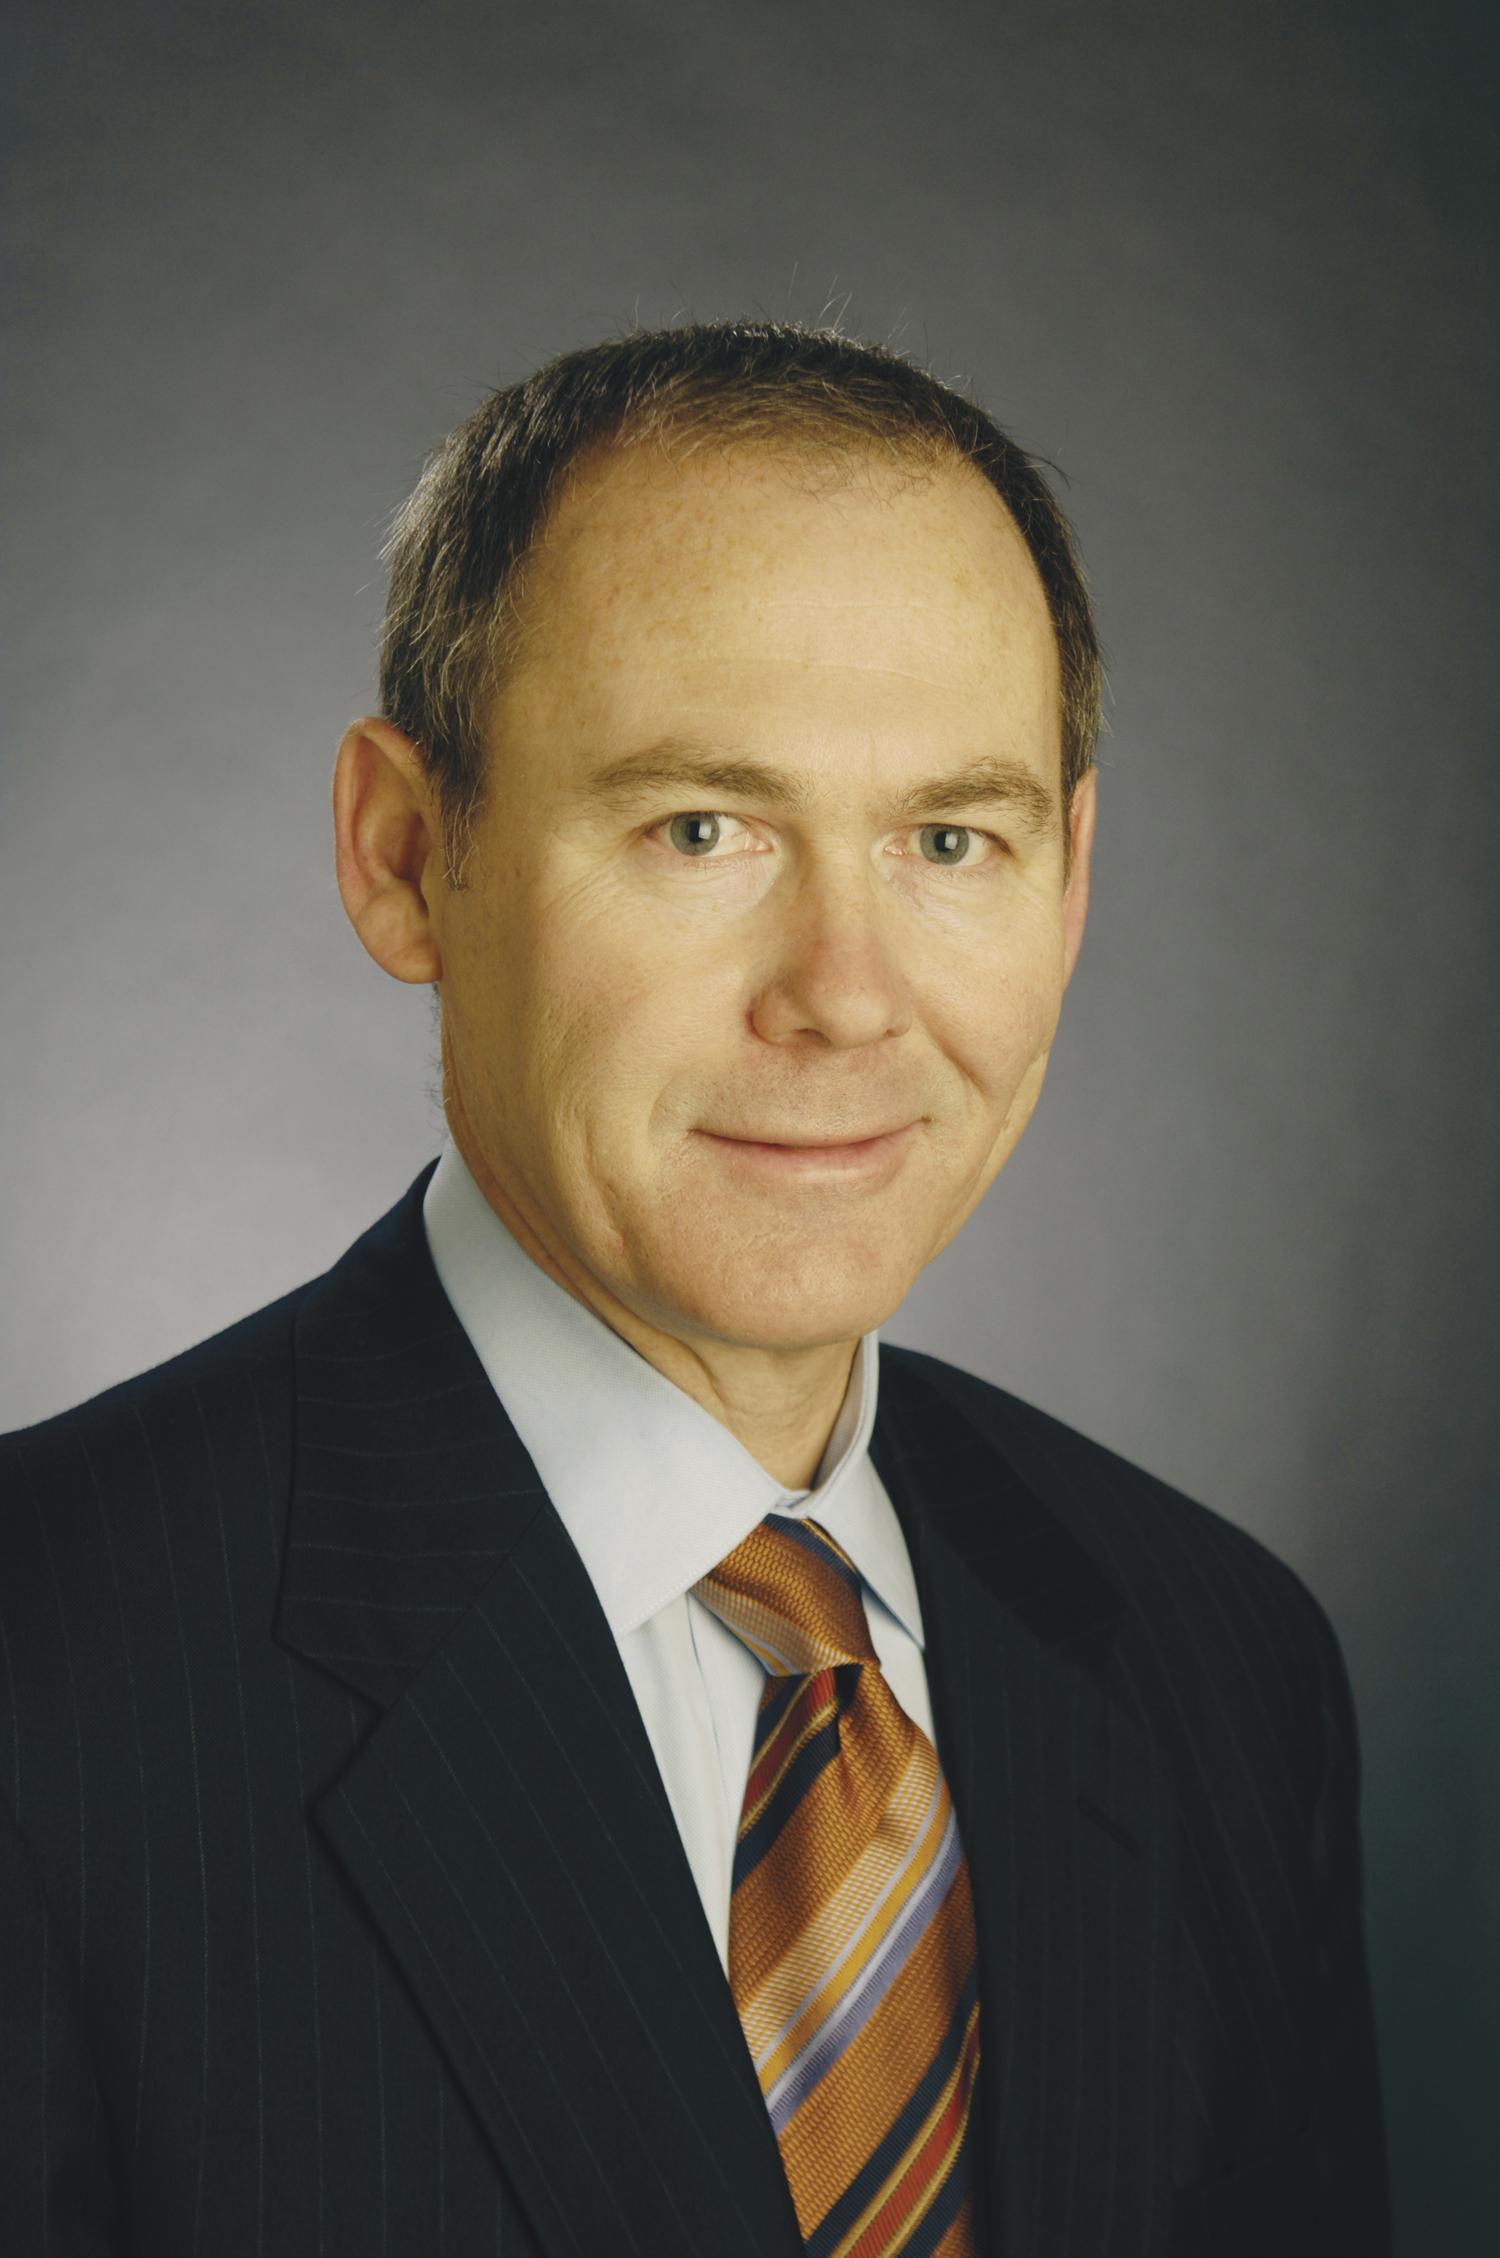 Owen J. Sullivan. Photo courtesy of Marquette University.